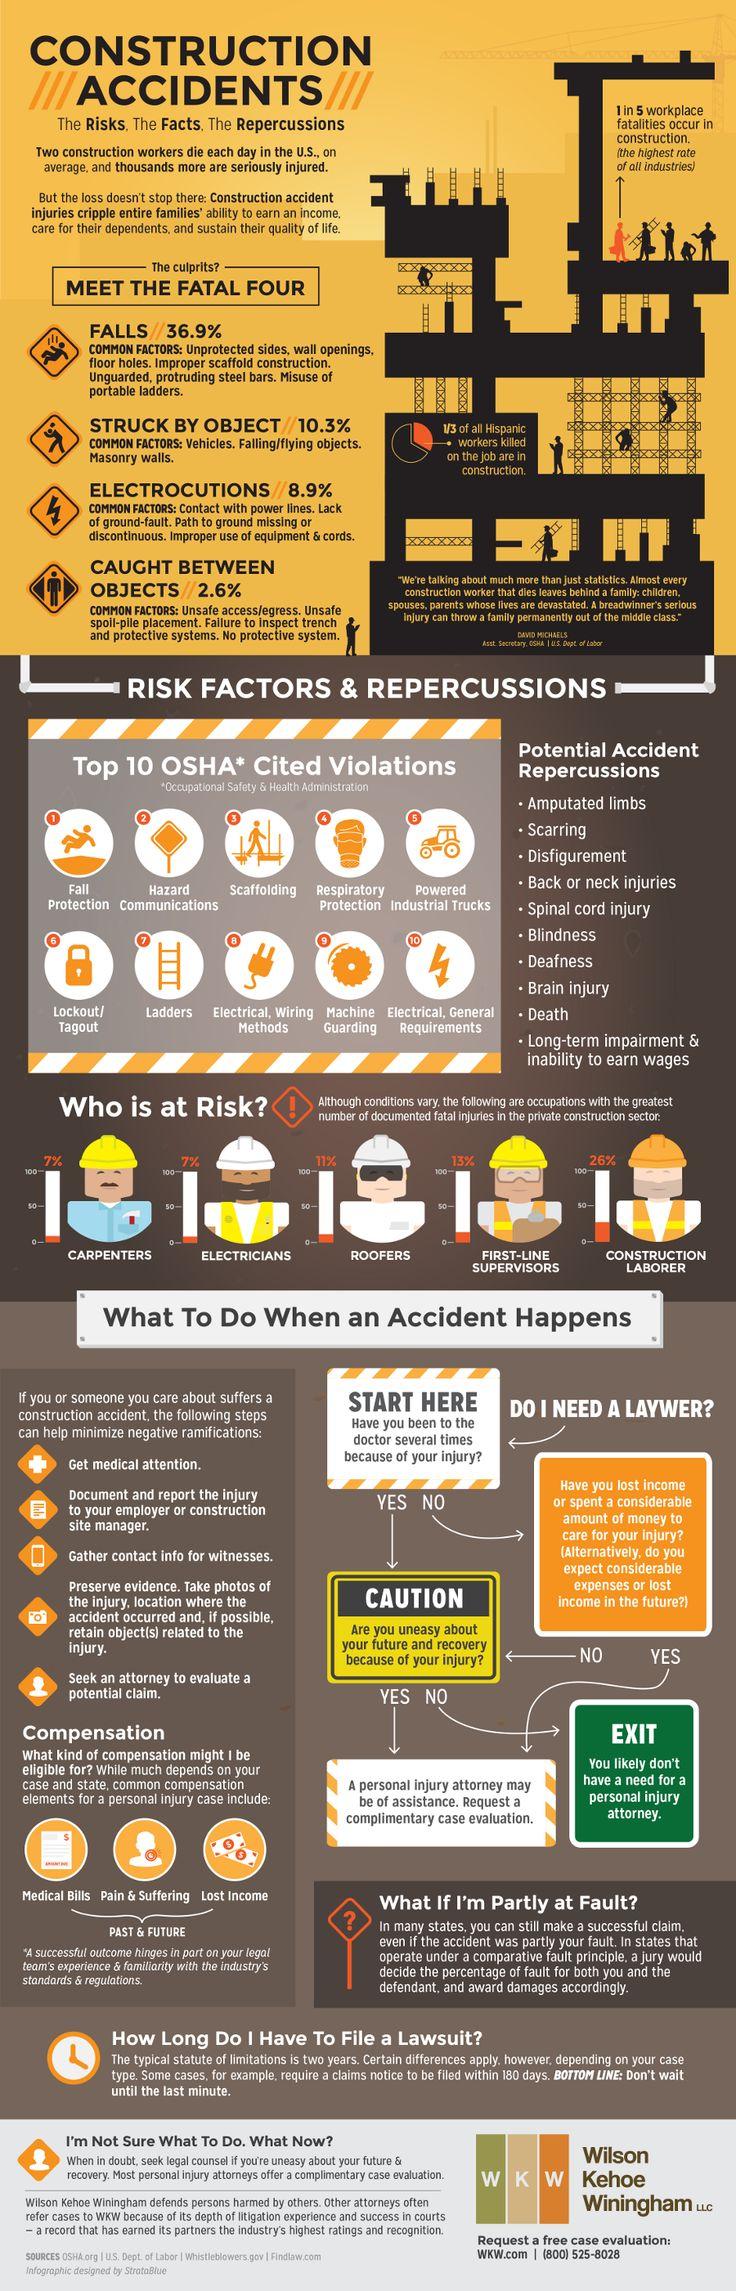 Best 25 Construction Safety Ideas On Pinterest Workplace Safety Tips Workplace Safety And